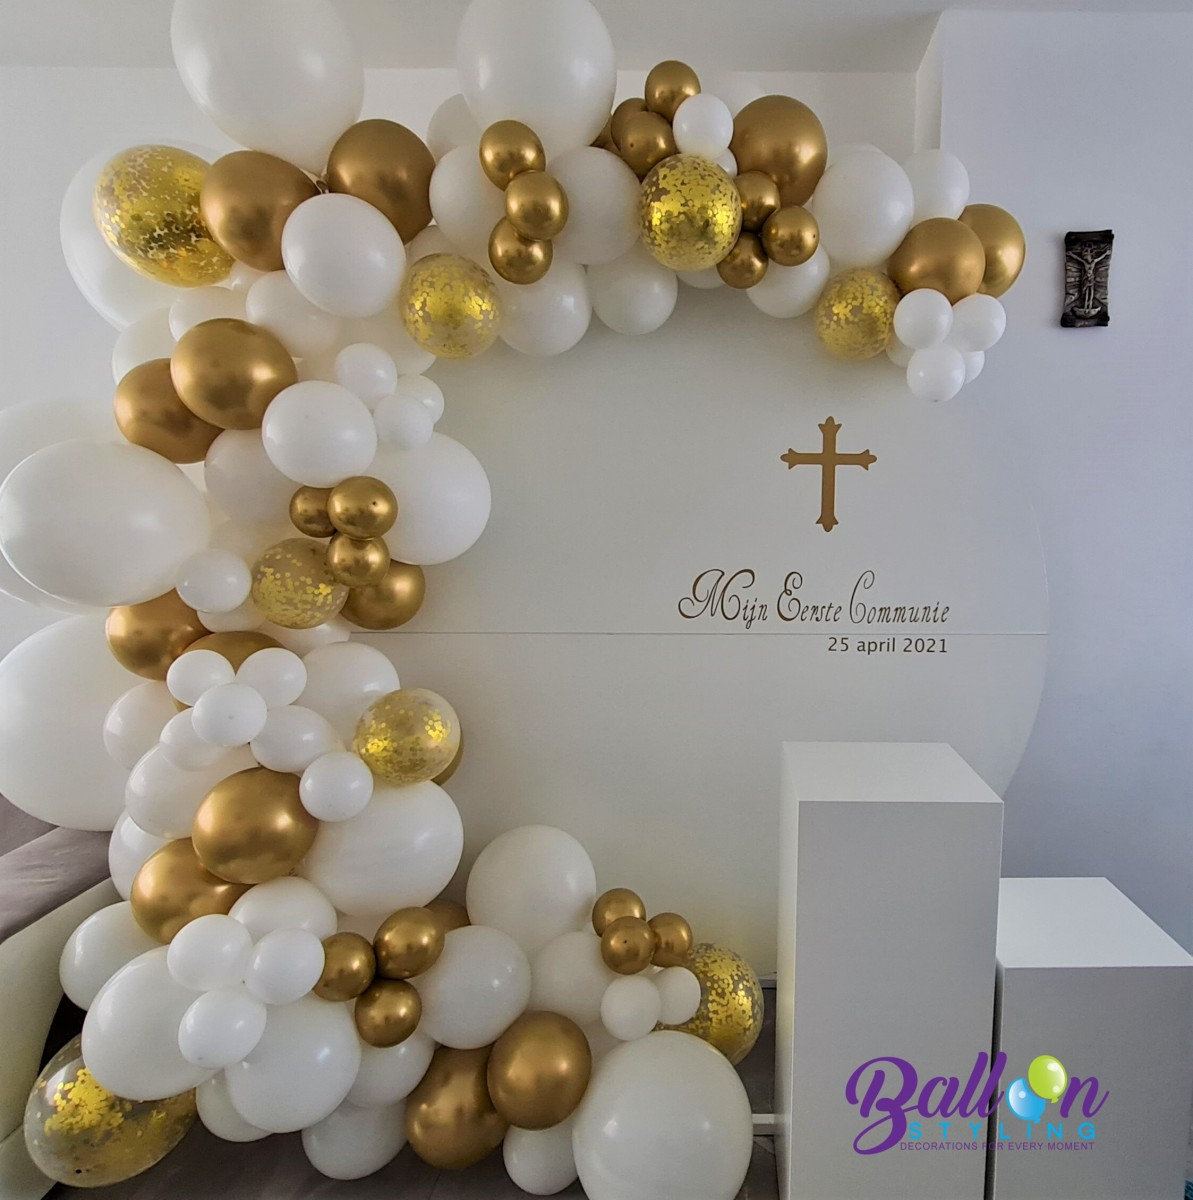 Balloon Styling Tilburg eerste communie backdrop zuilen pilaren chrome goud confettiballonnen ballonnen Tilburg (1)